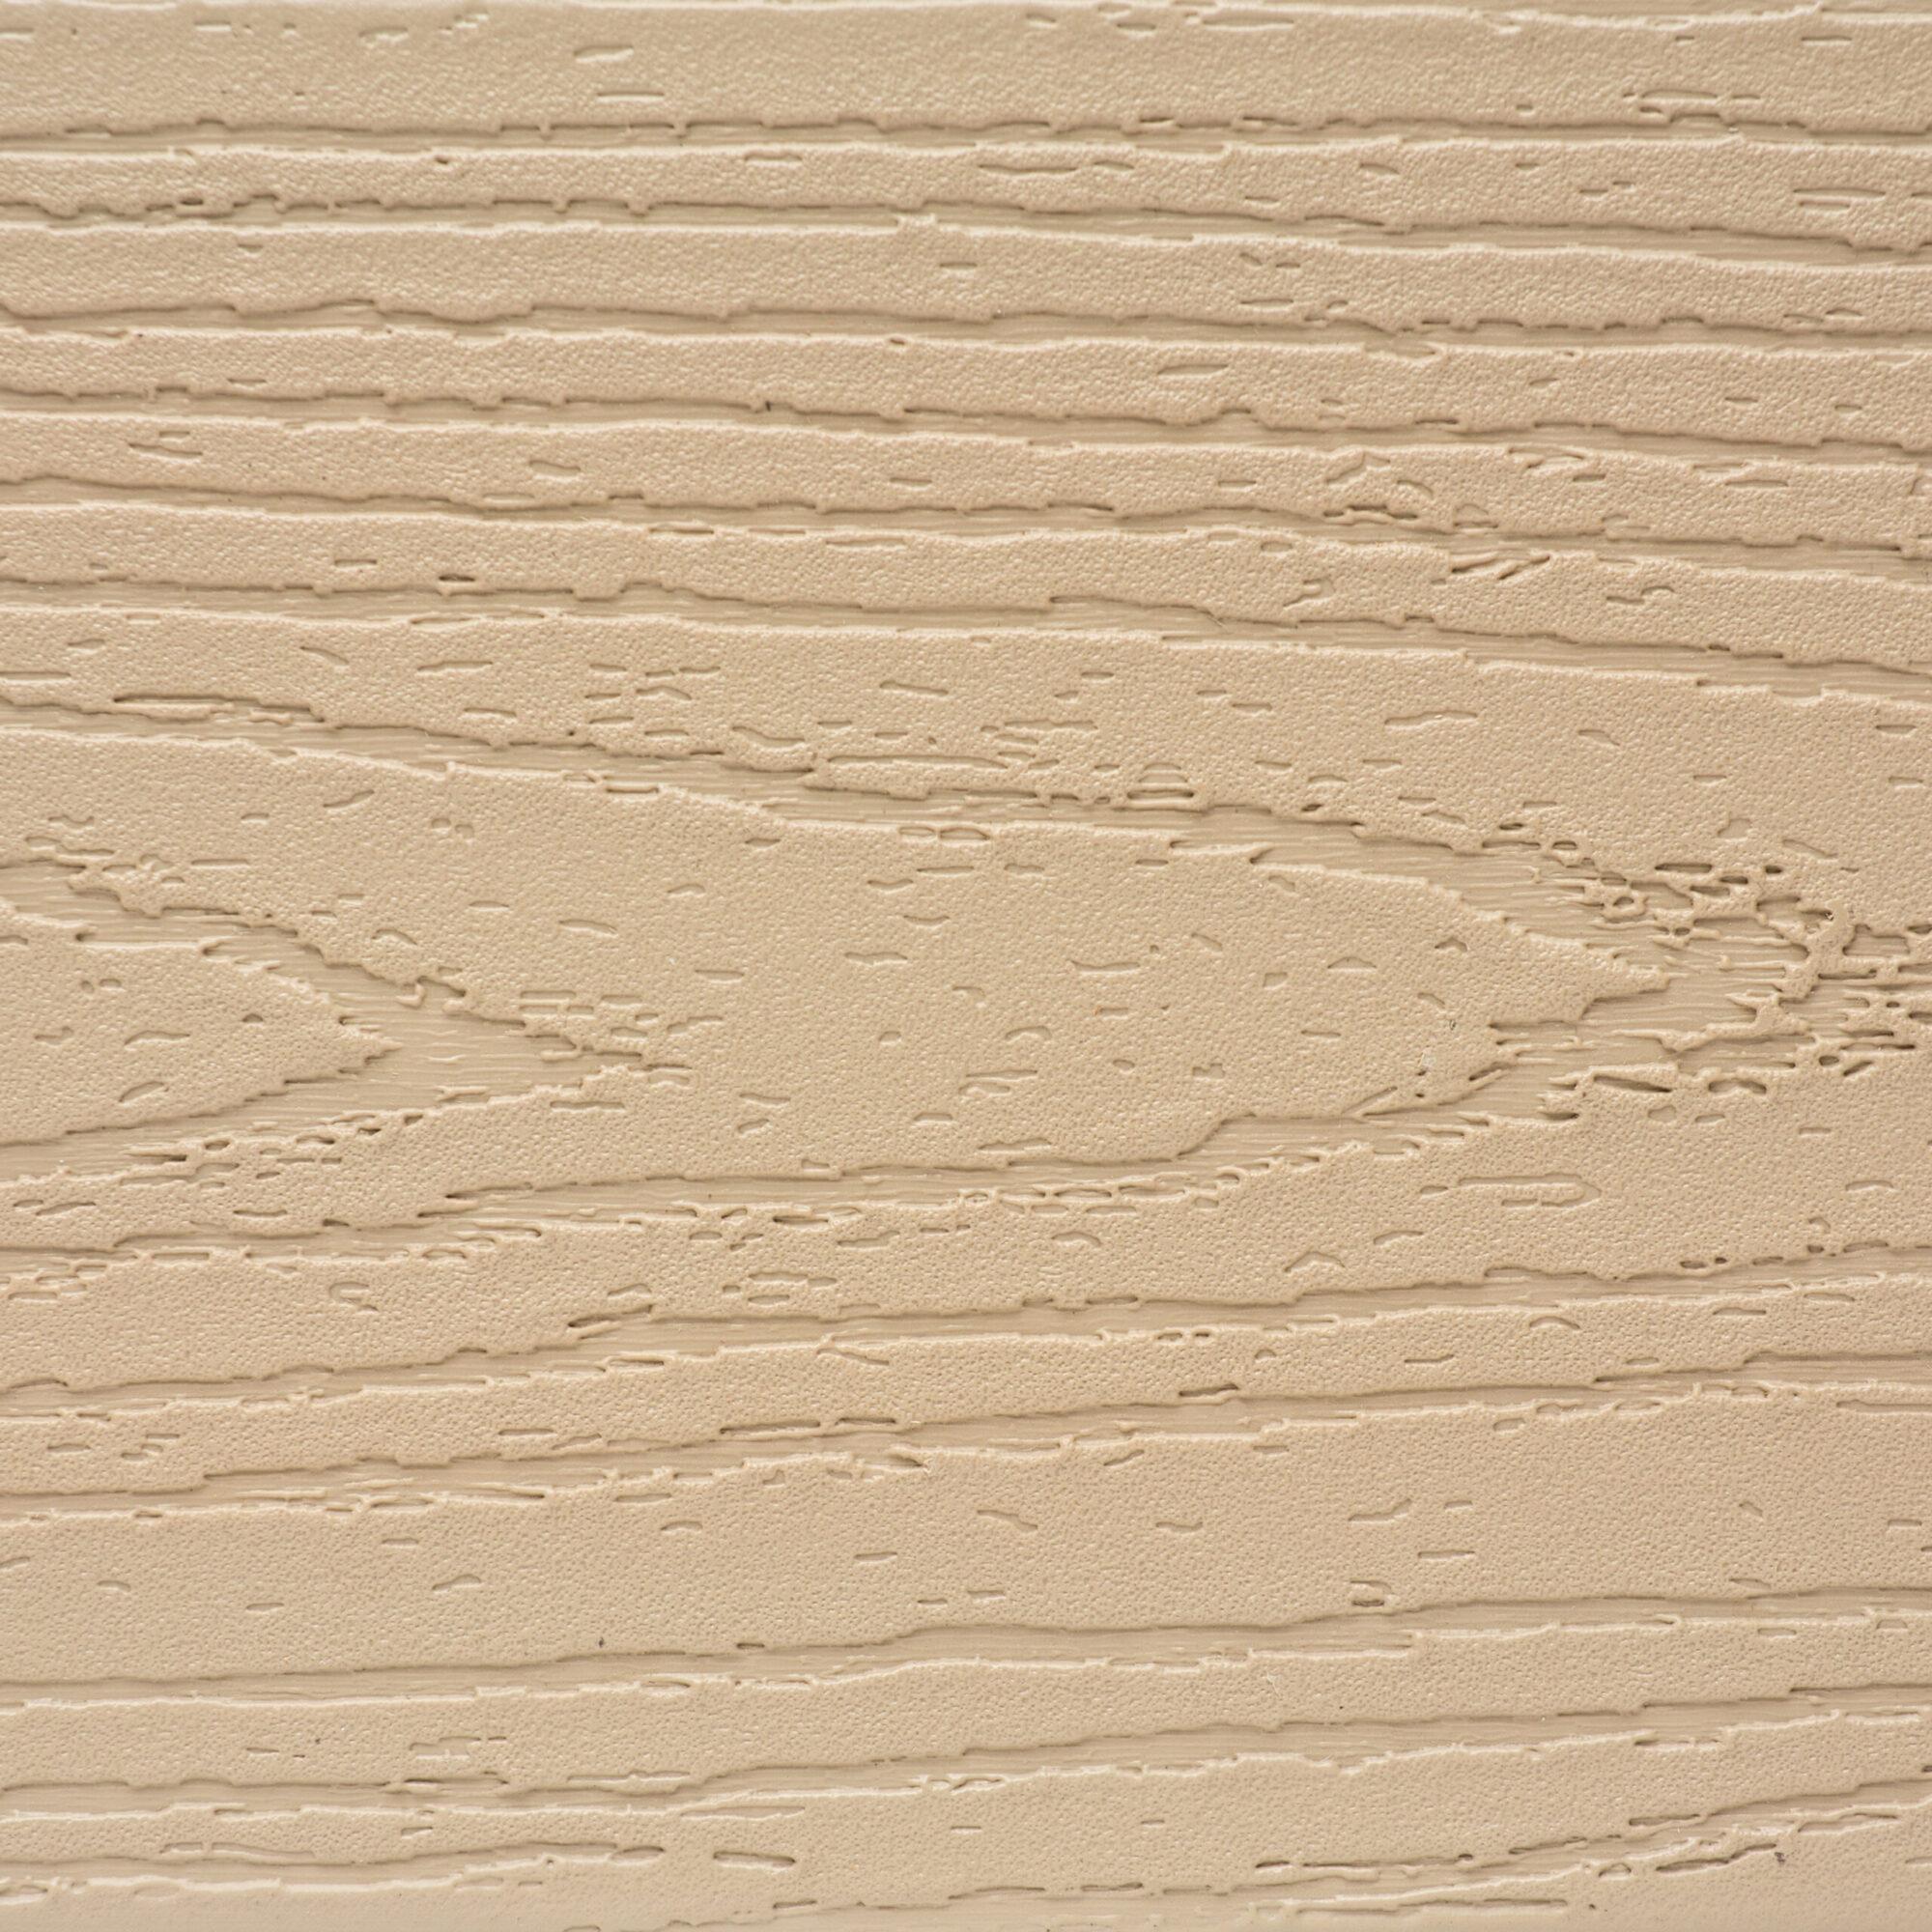 Elite-Sandy-Beach-Texture